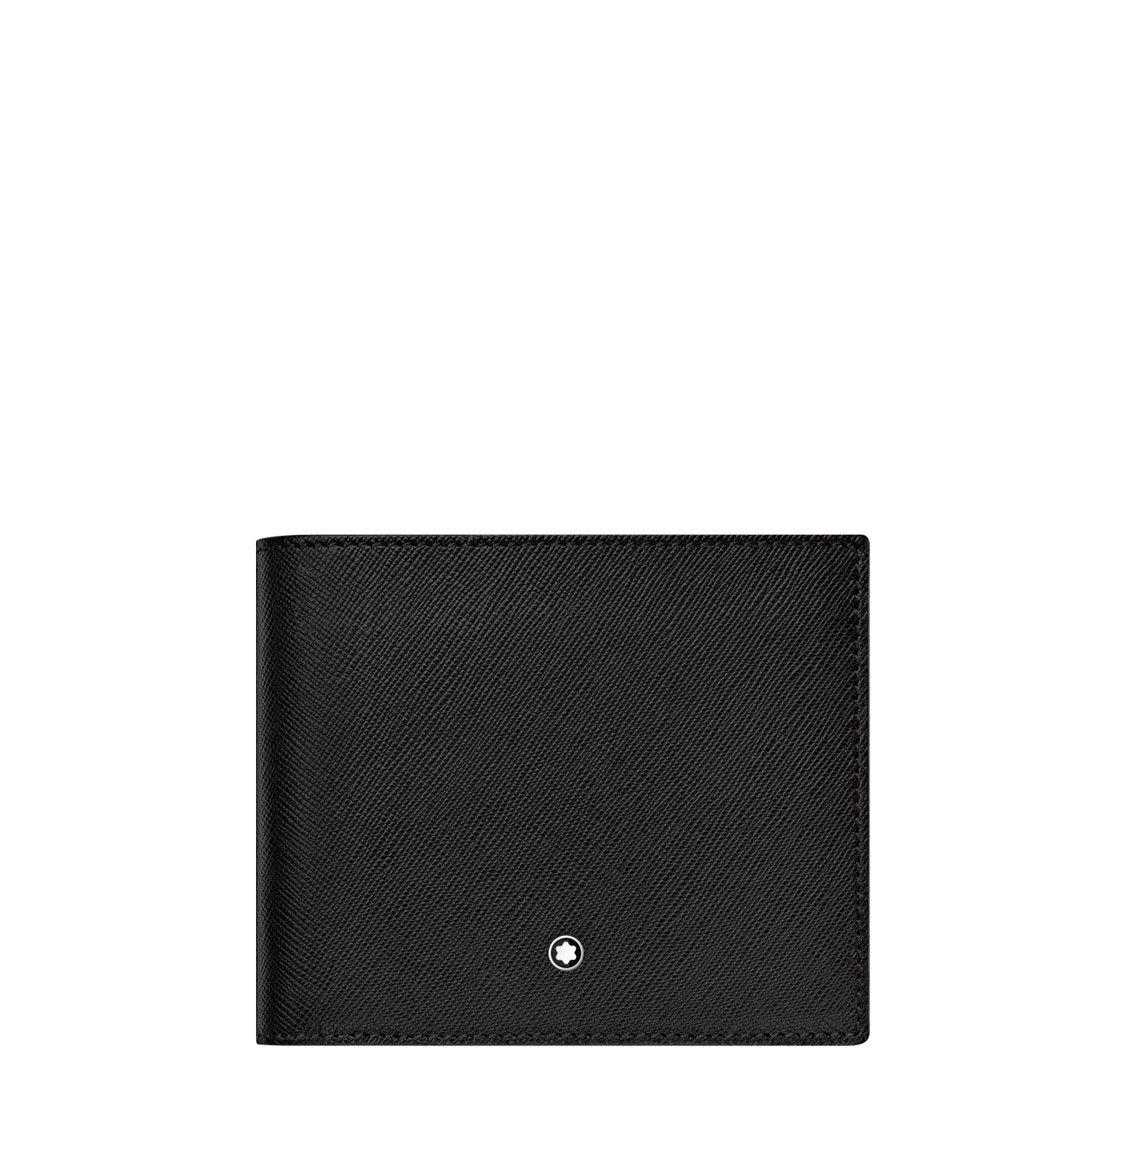 Montblanc Sartorial Wallet 8cc Black